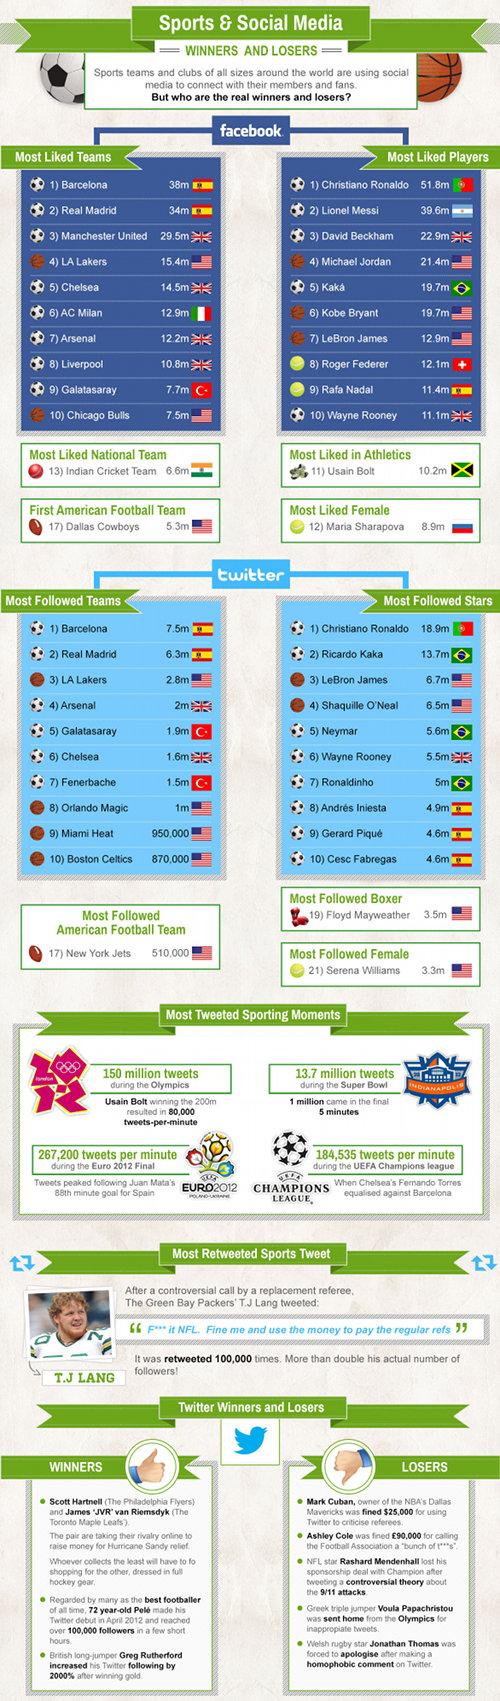 Sports & Social Media: Winners & Losers